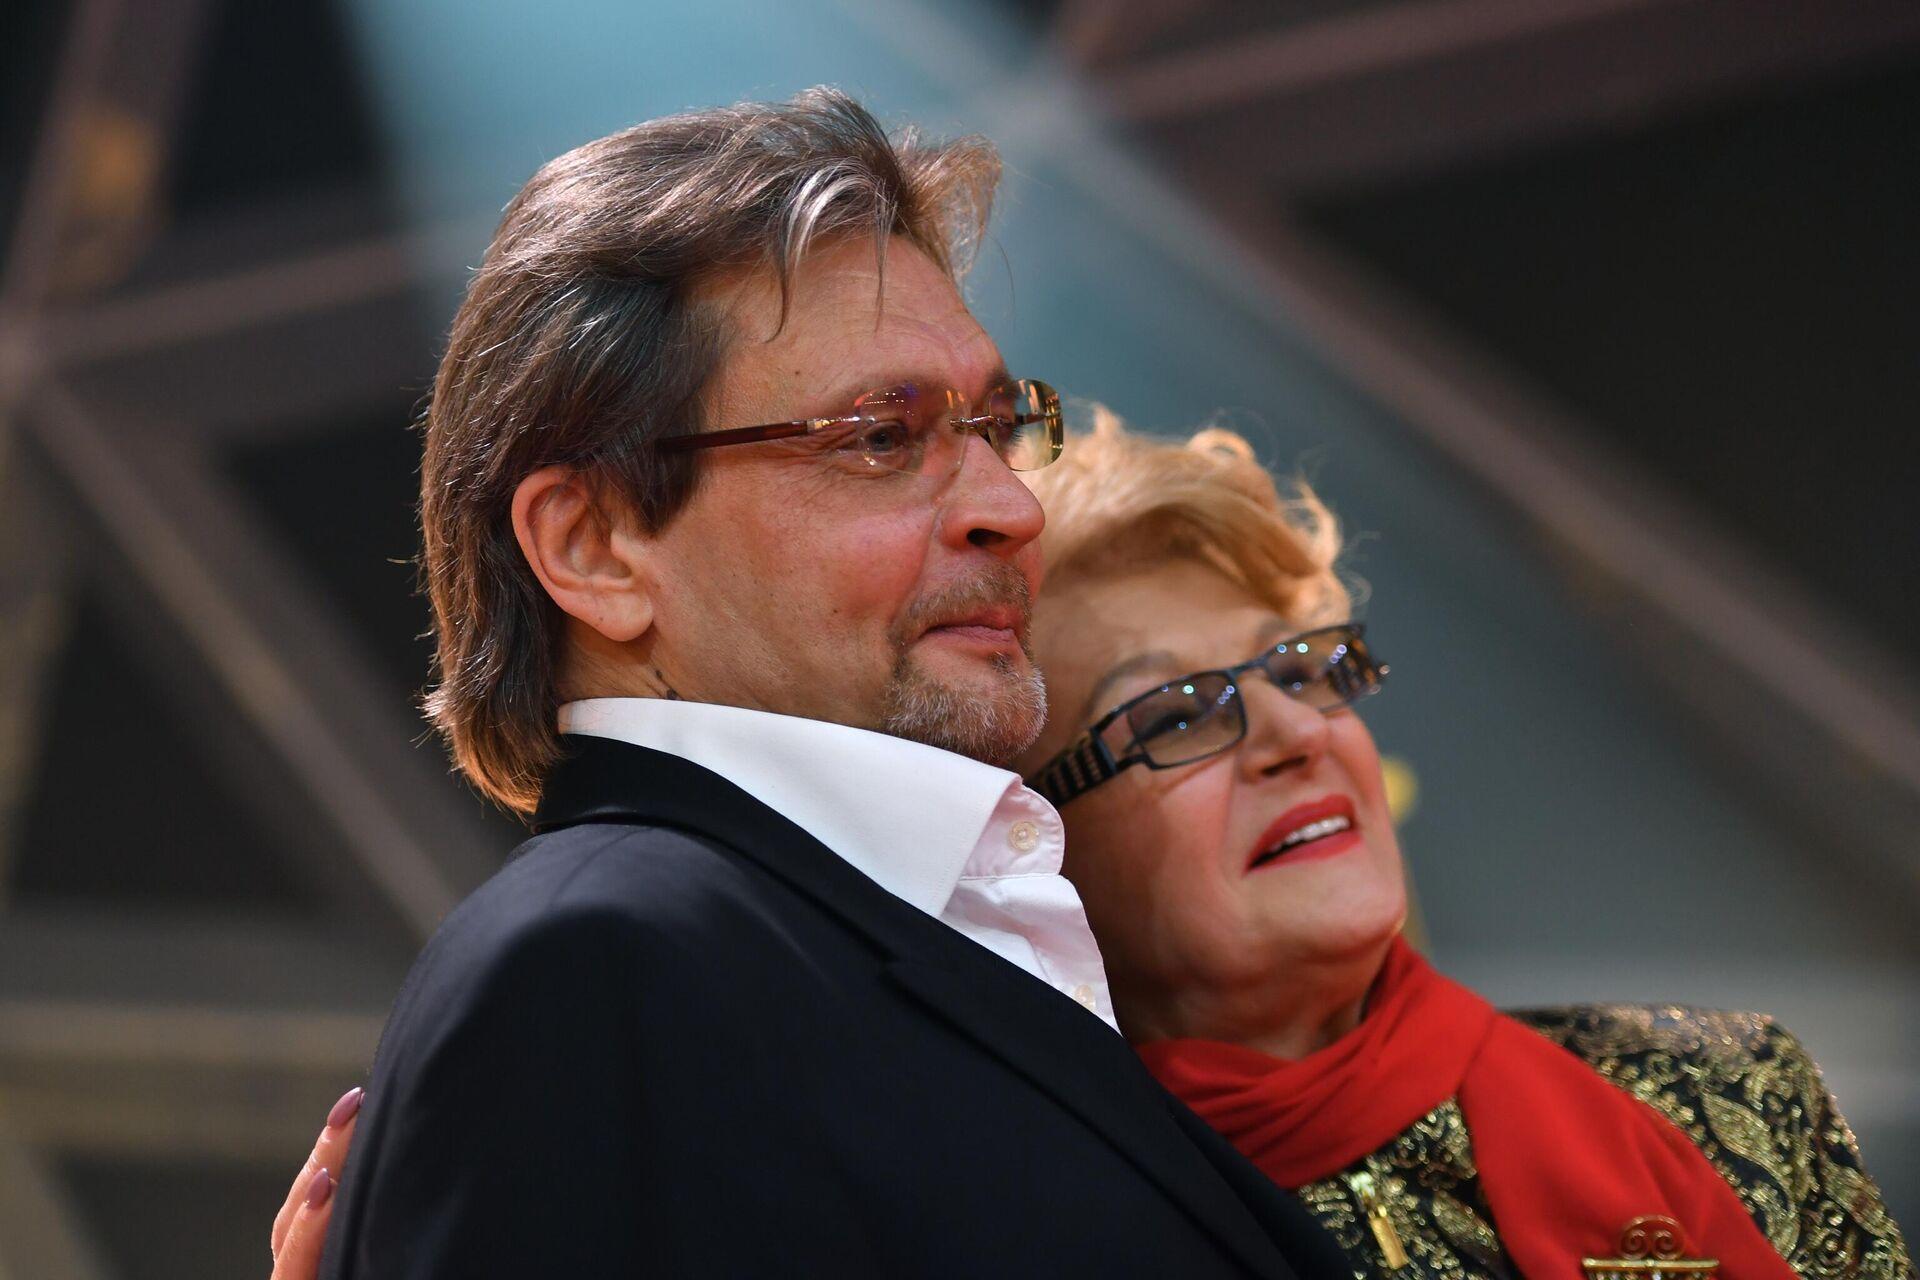 Светлана Дружинина и ее муж